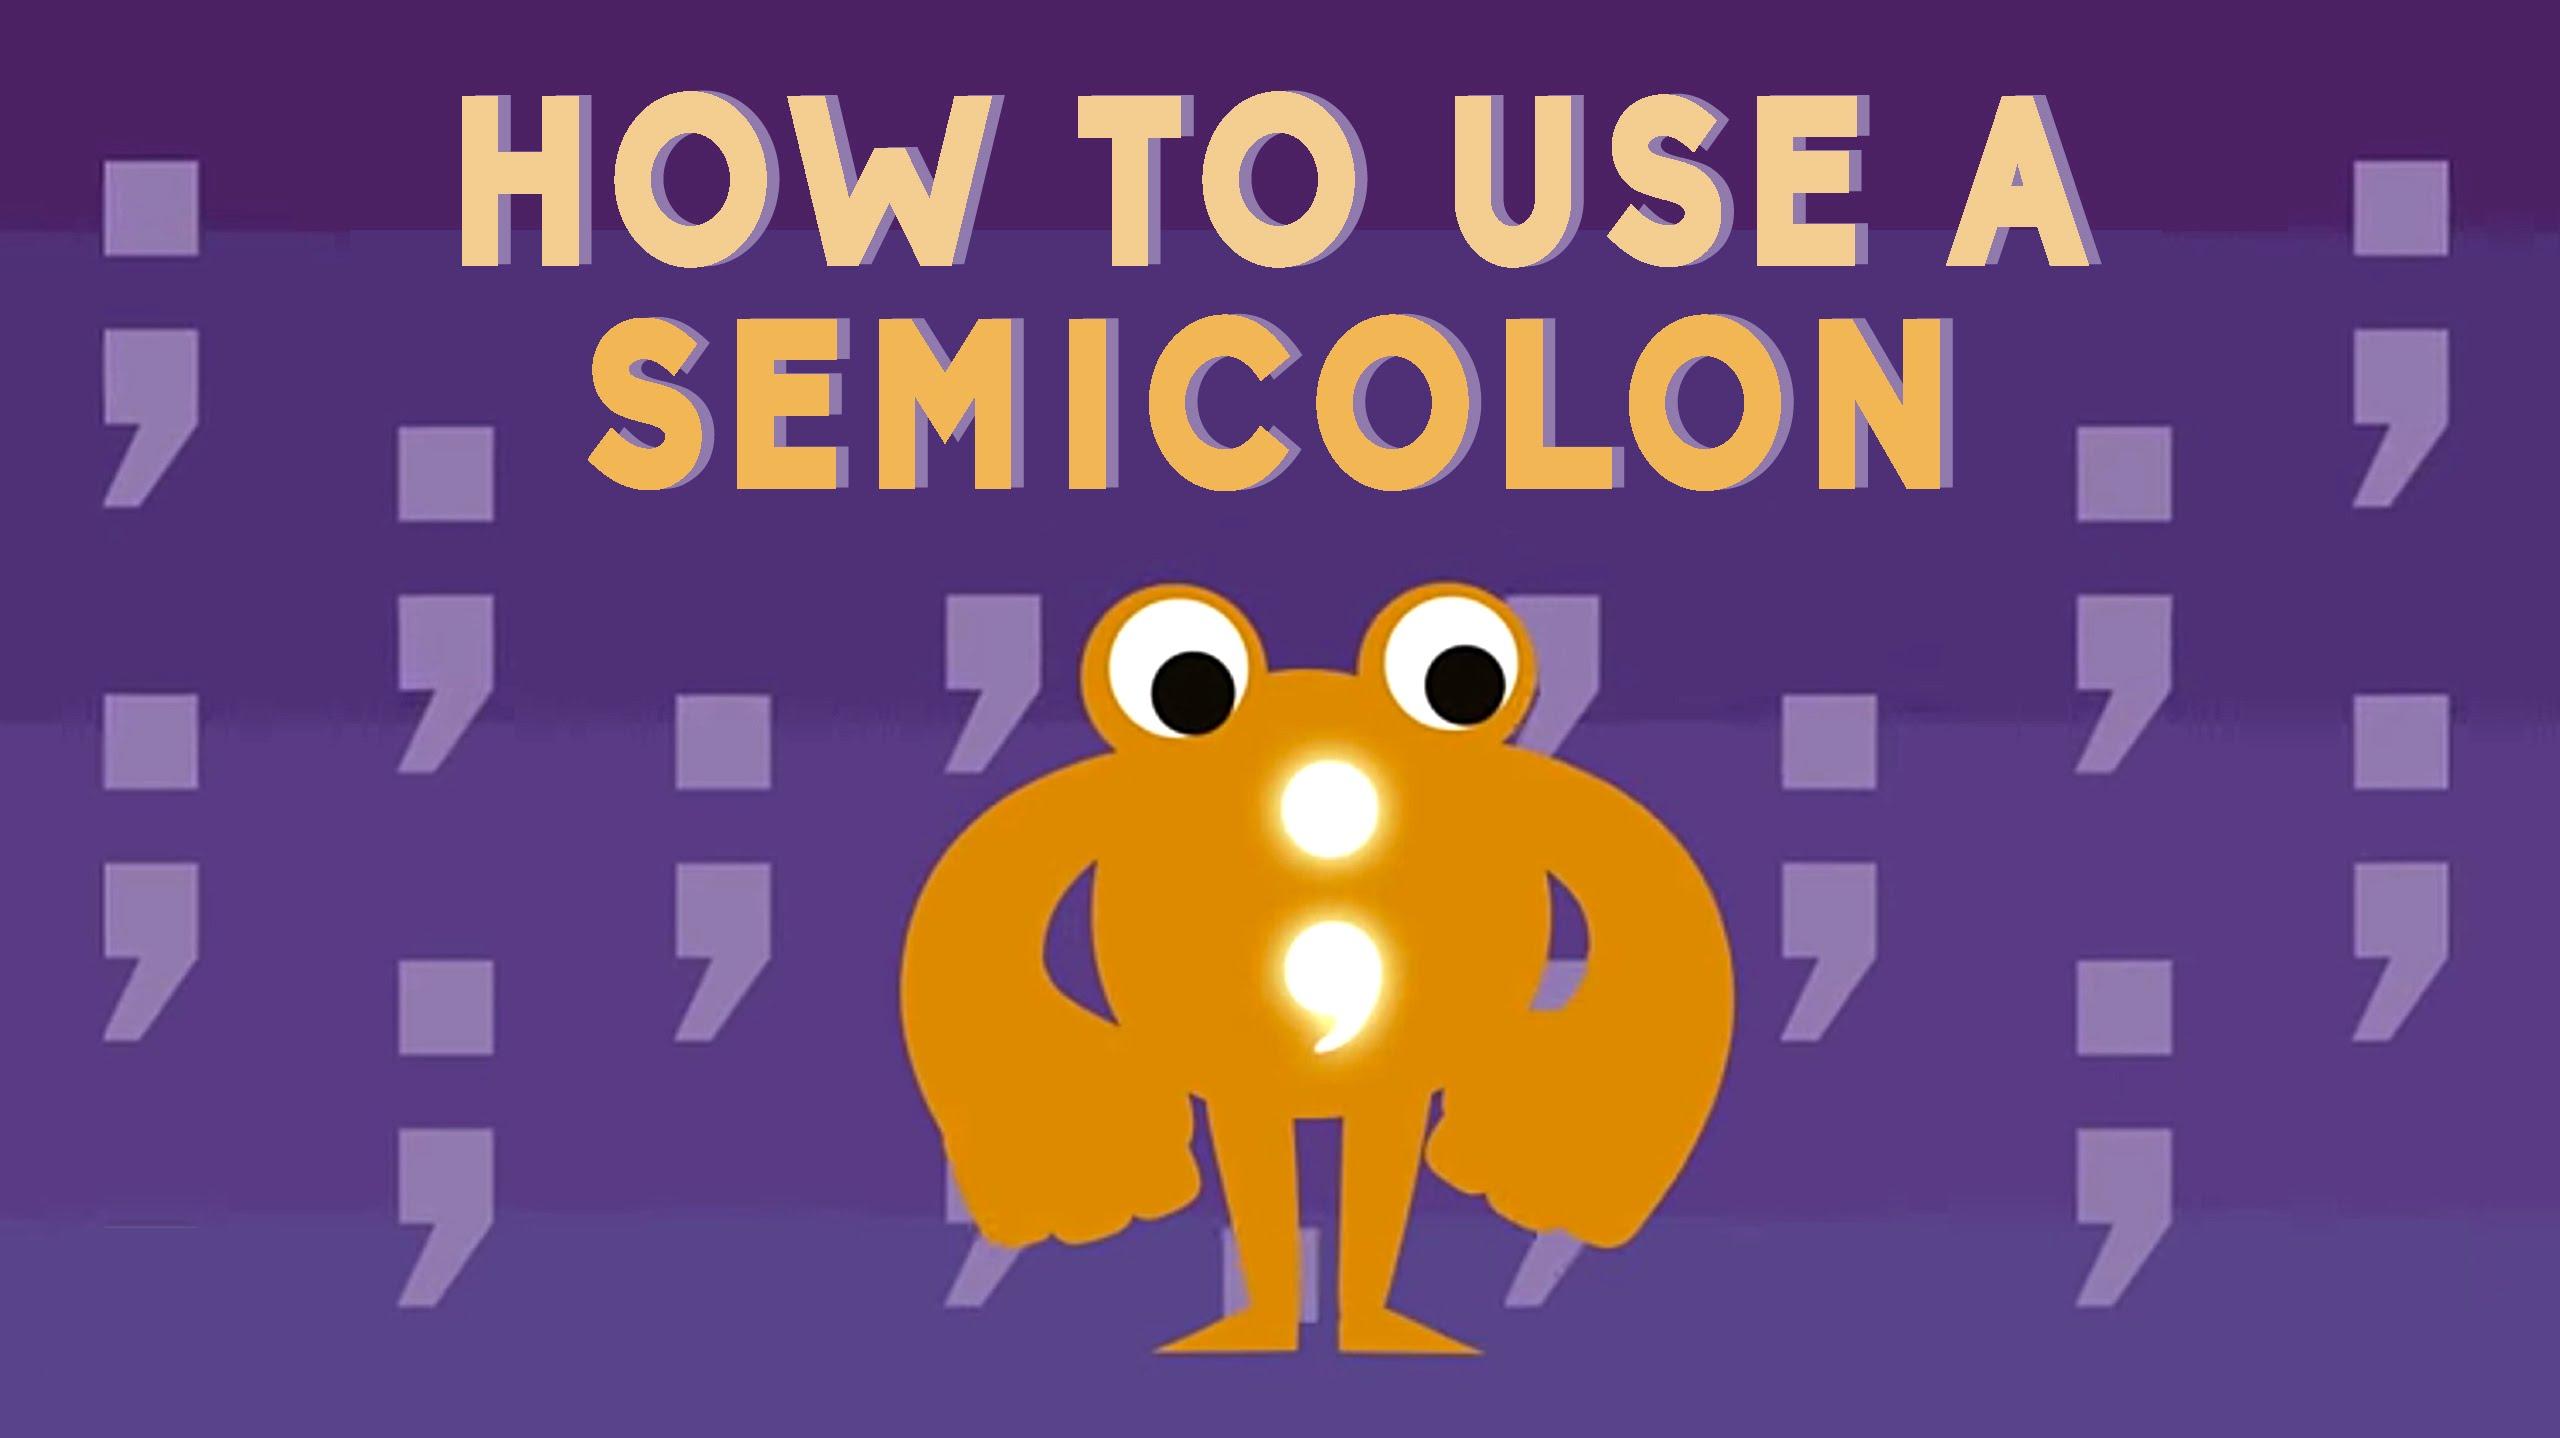 「【Ted Ed】陰のヒーロー『セミコロン』って何者?!」- How to Use a Semicolon